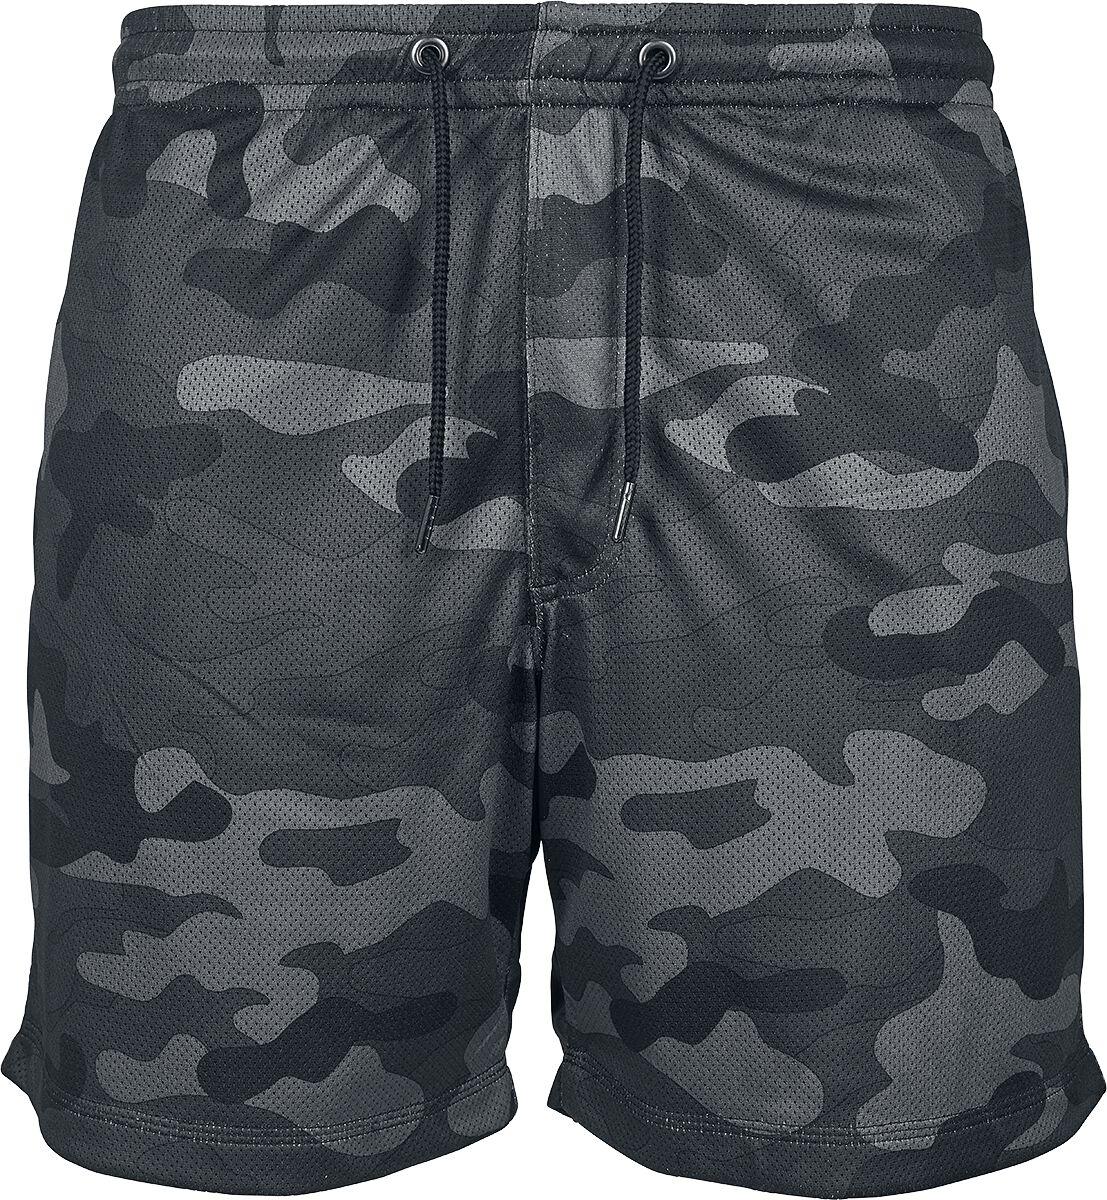 Image of   Urban Classics Camo Mesh Shorts Shorts mørk camo